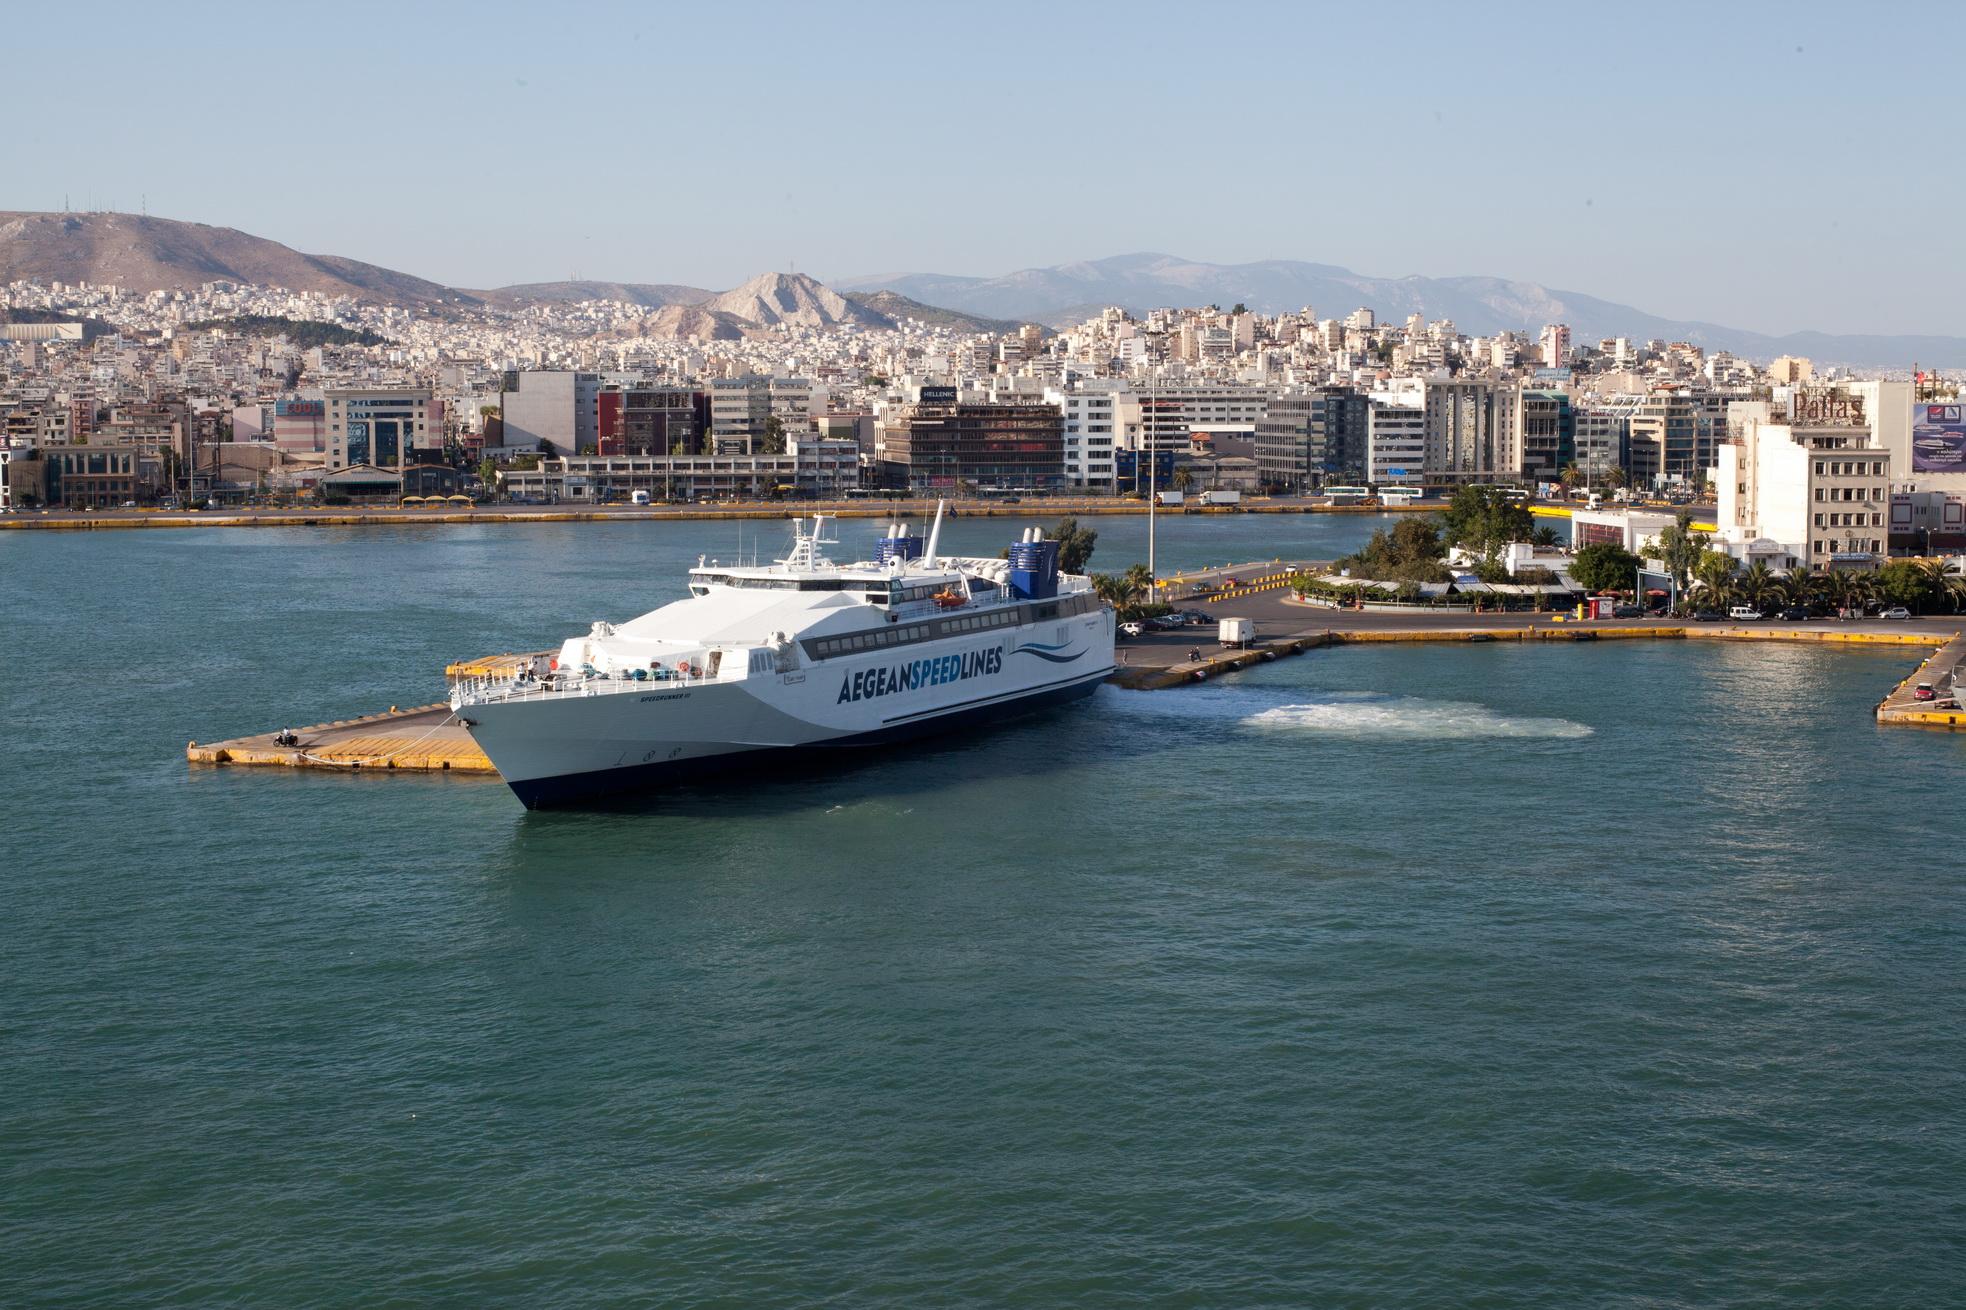 MS Speedrunner III IMO 9141871 Aegean Speed Lines docking Piraeus Port of Athens Greece 04